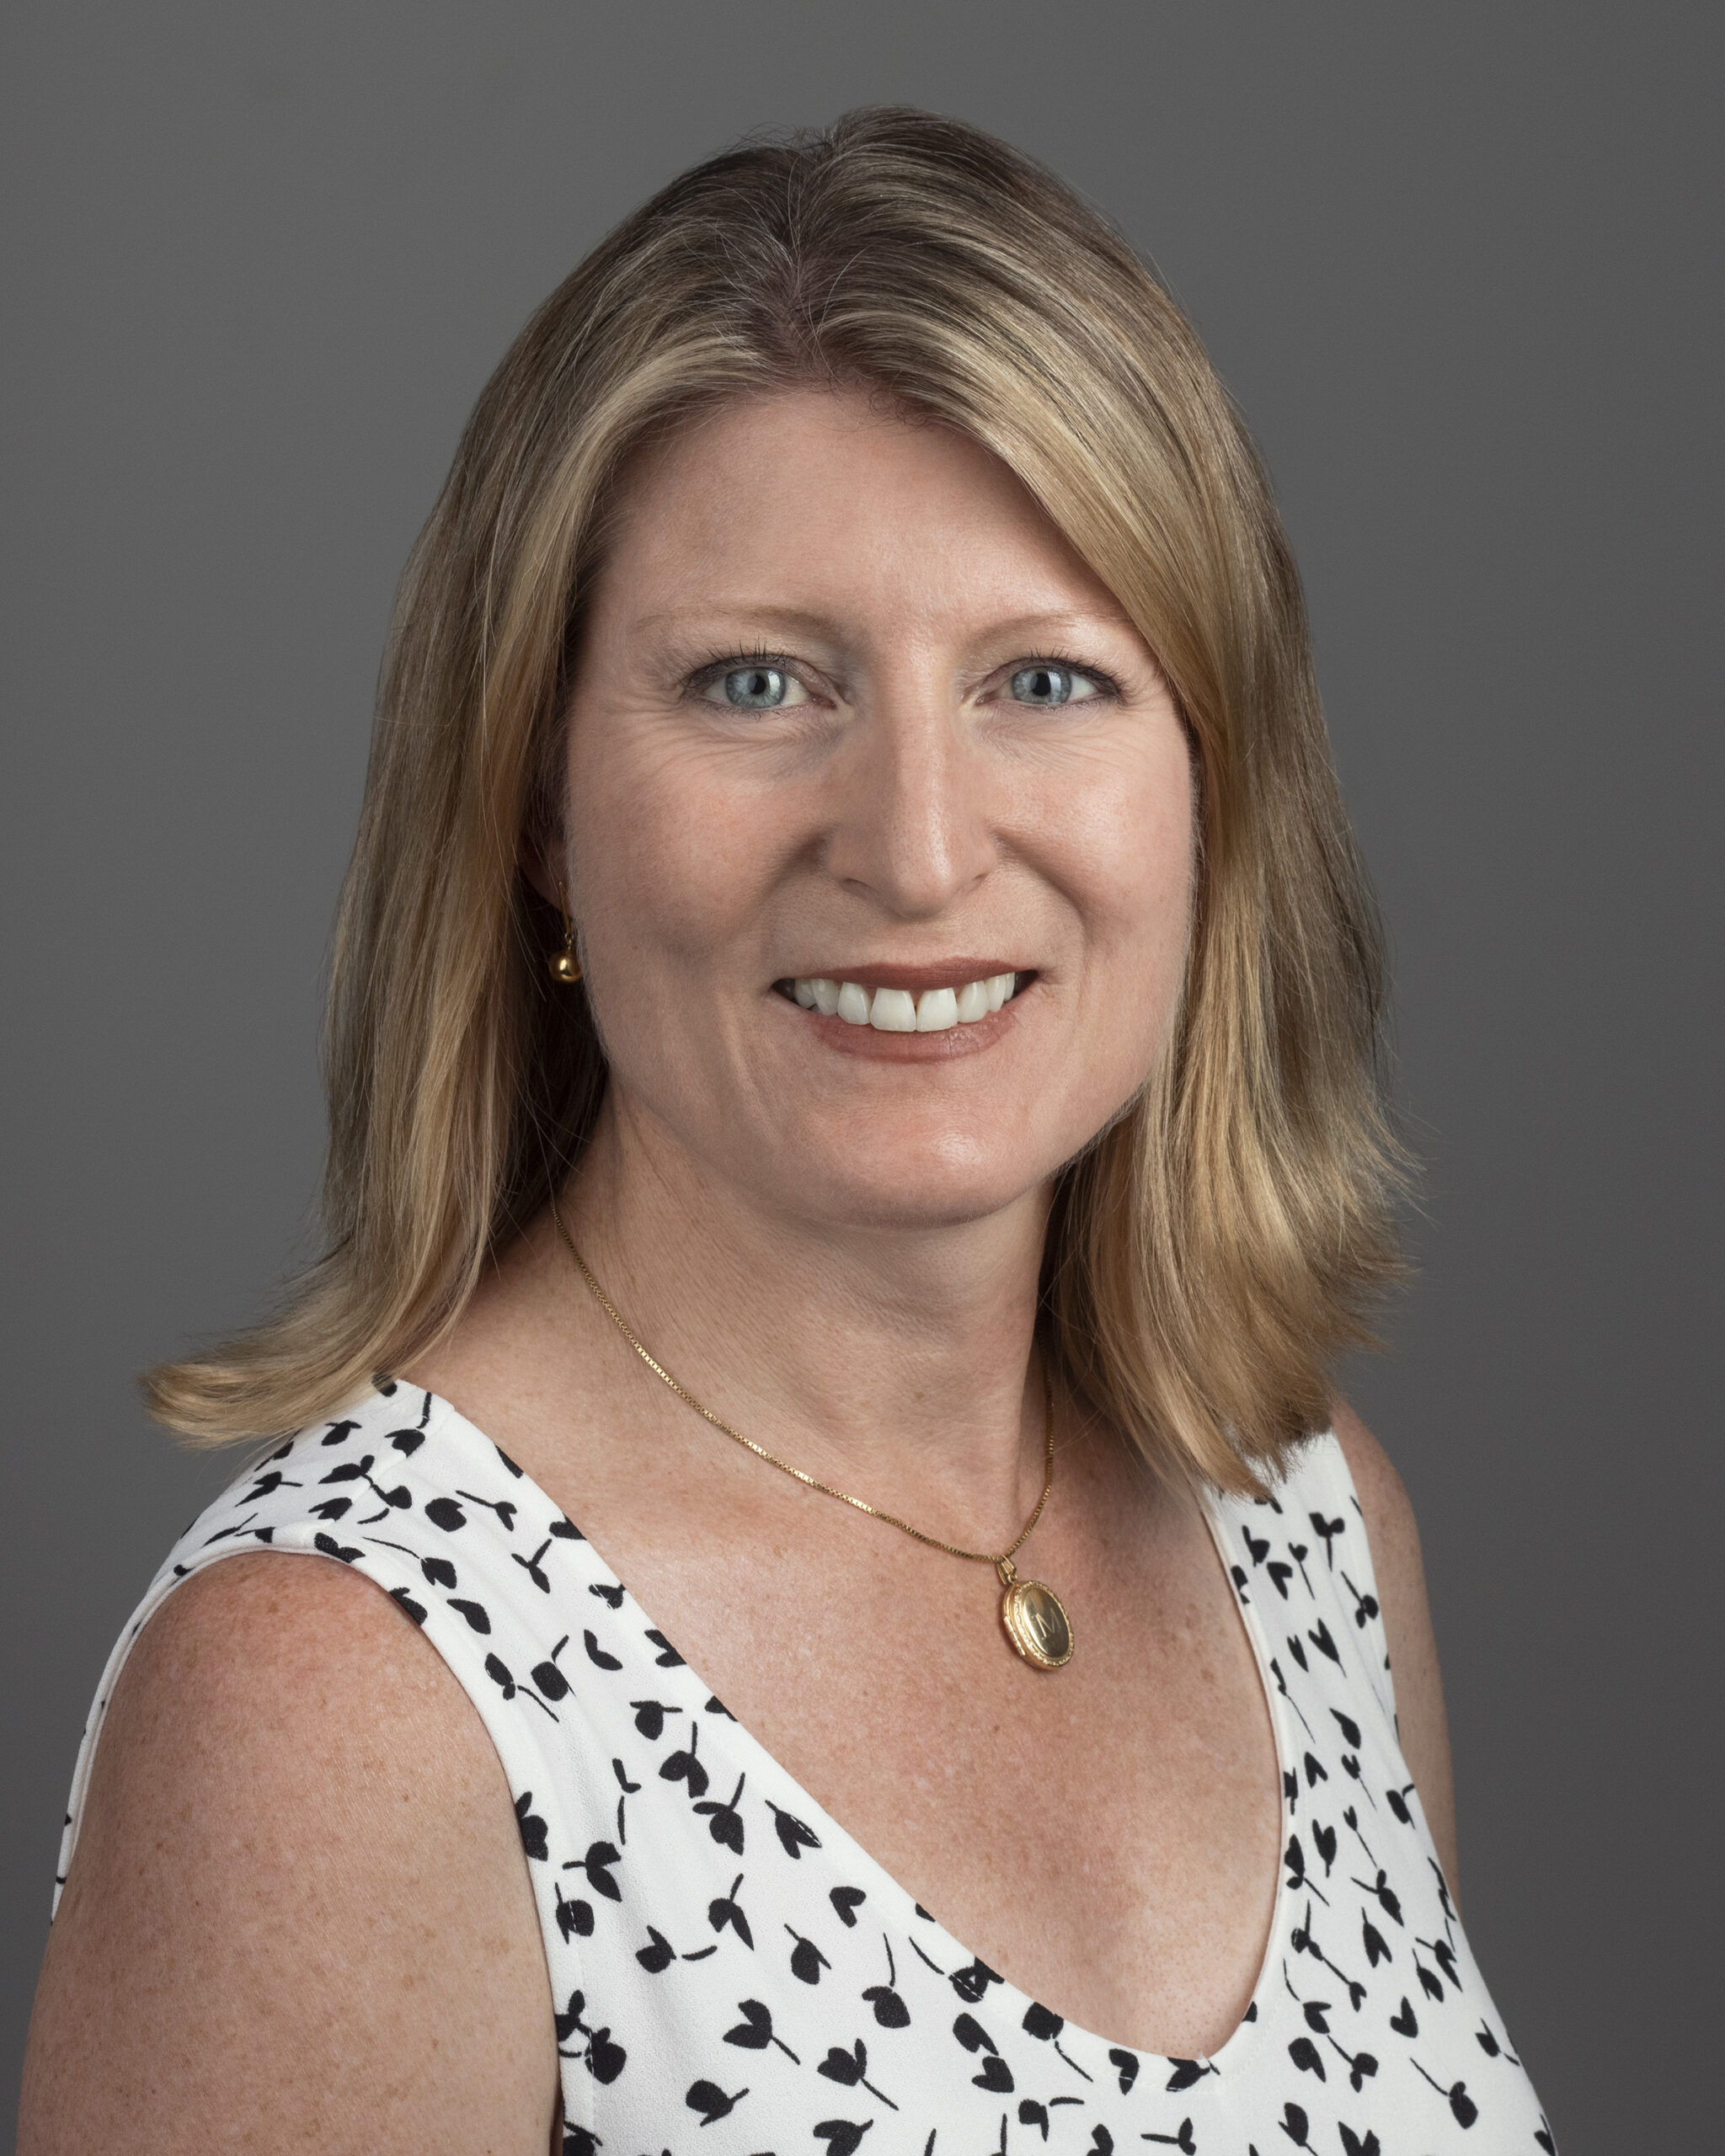 Treasurer - Maureen E. Farrell, MD